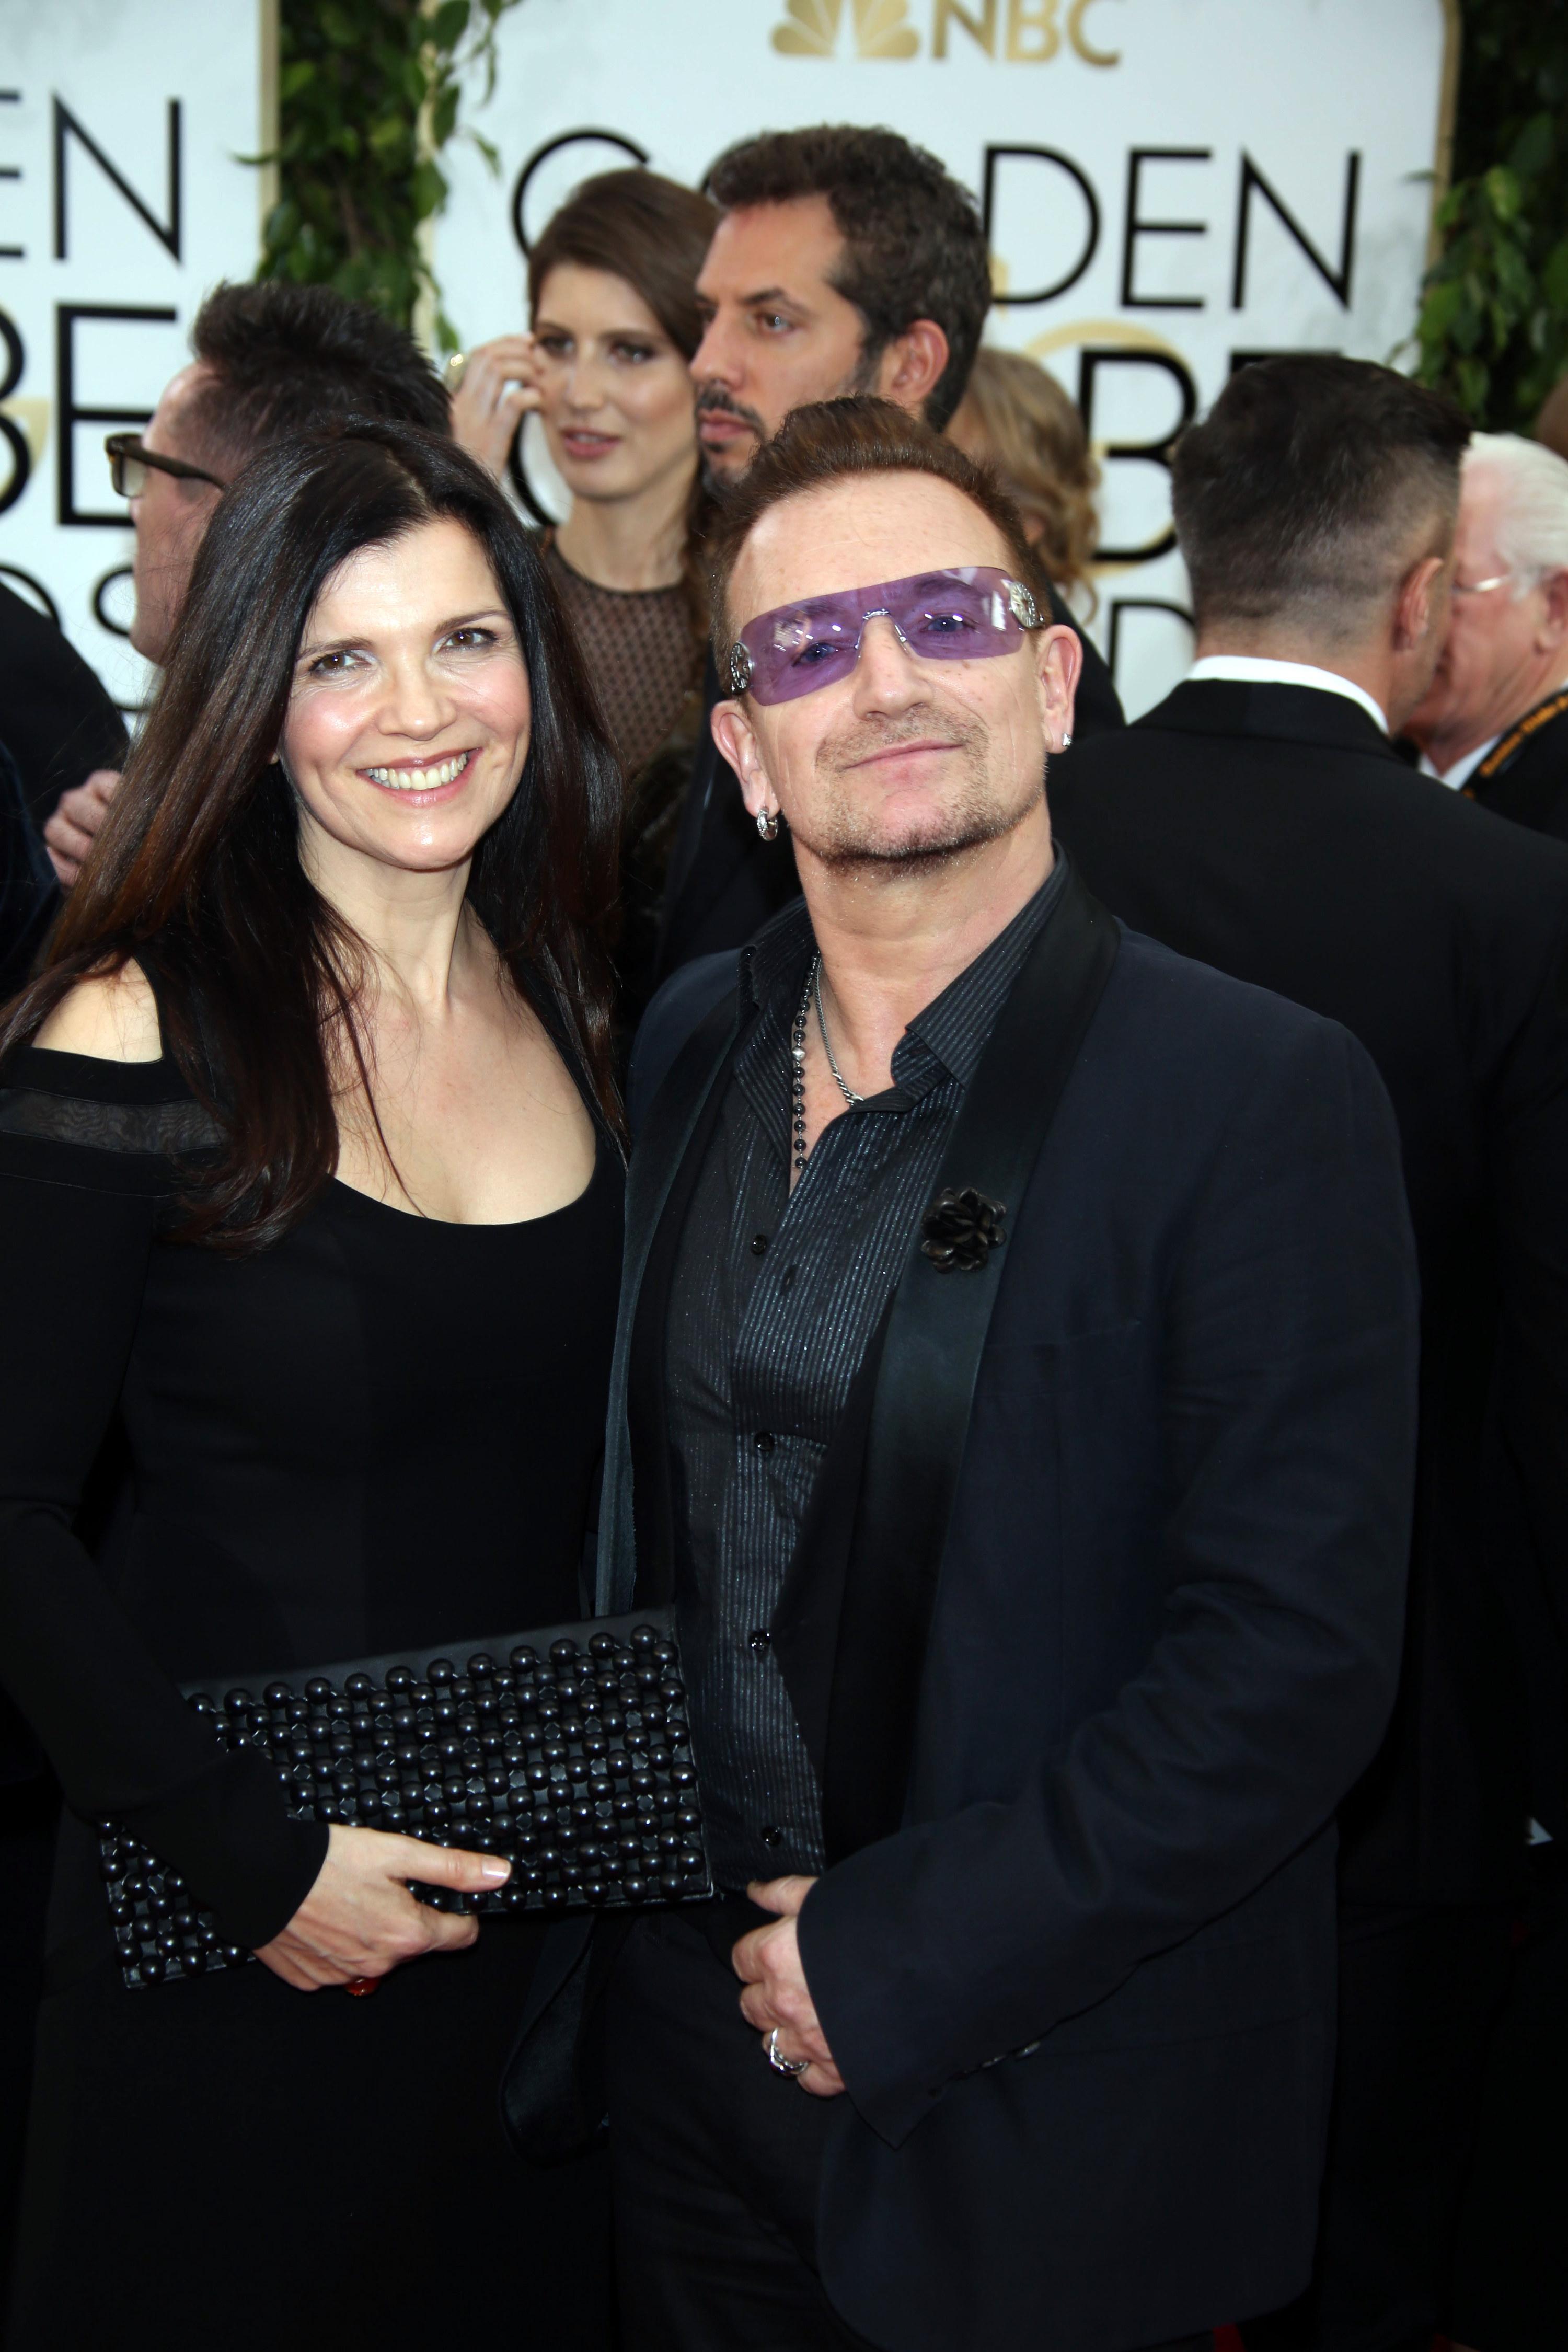 he has purple sunglasses she is wondering why